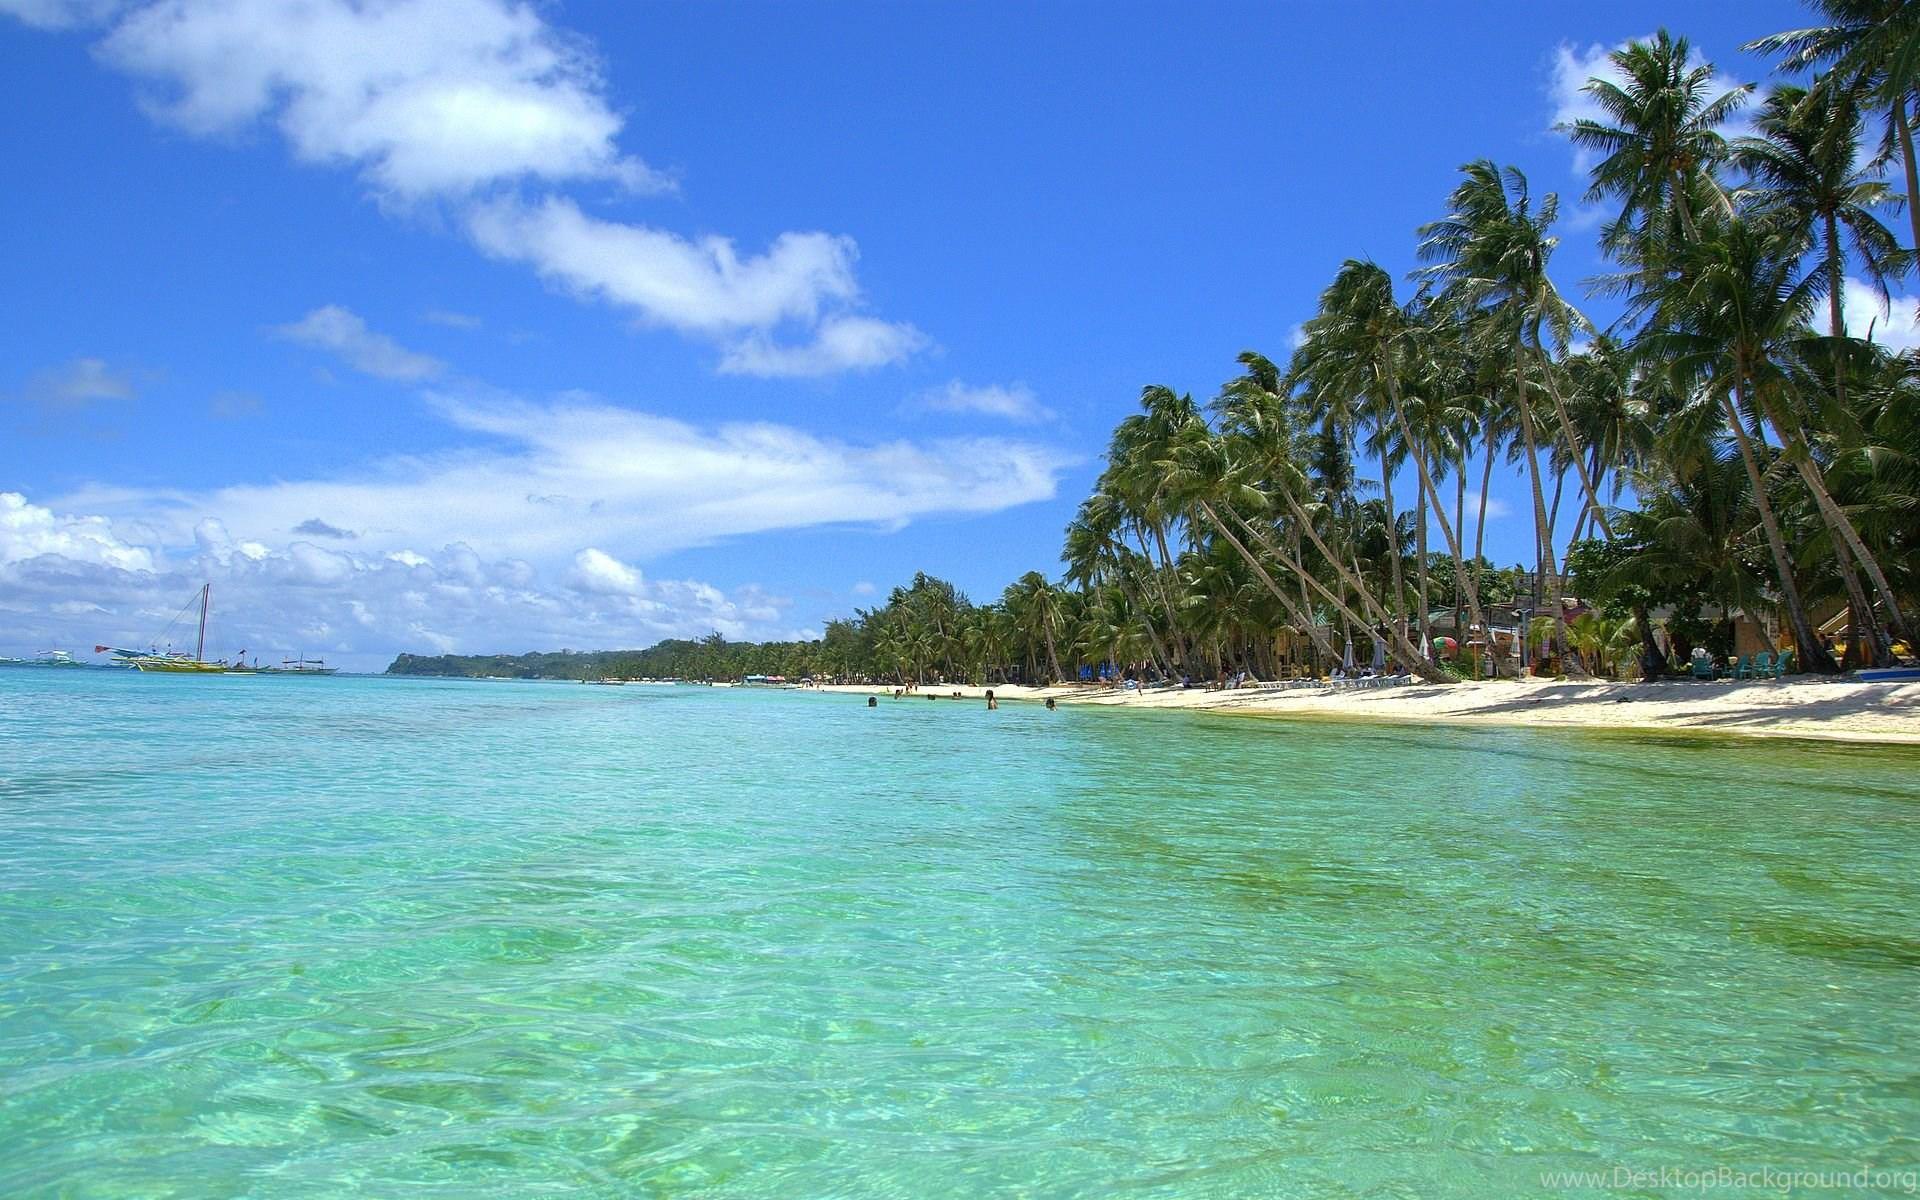 tropical beach scenes wallpapers free wallpaper images desktop